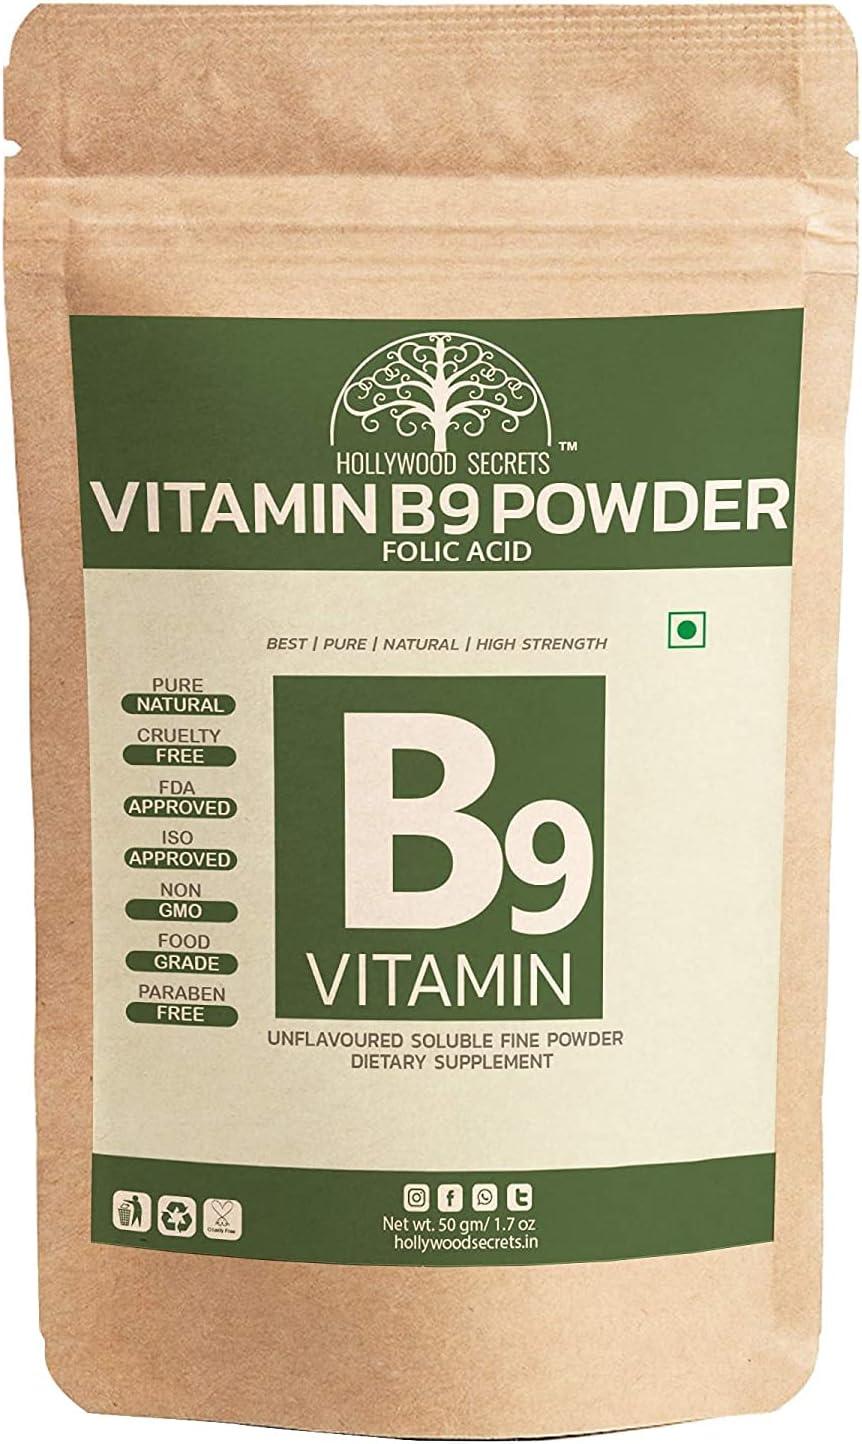 Sales Madow Vitamin B9 Courier shipping free Folic Acid 50gm Powder